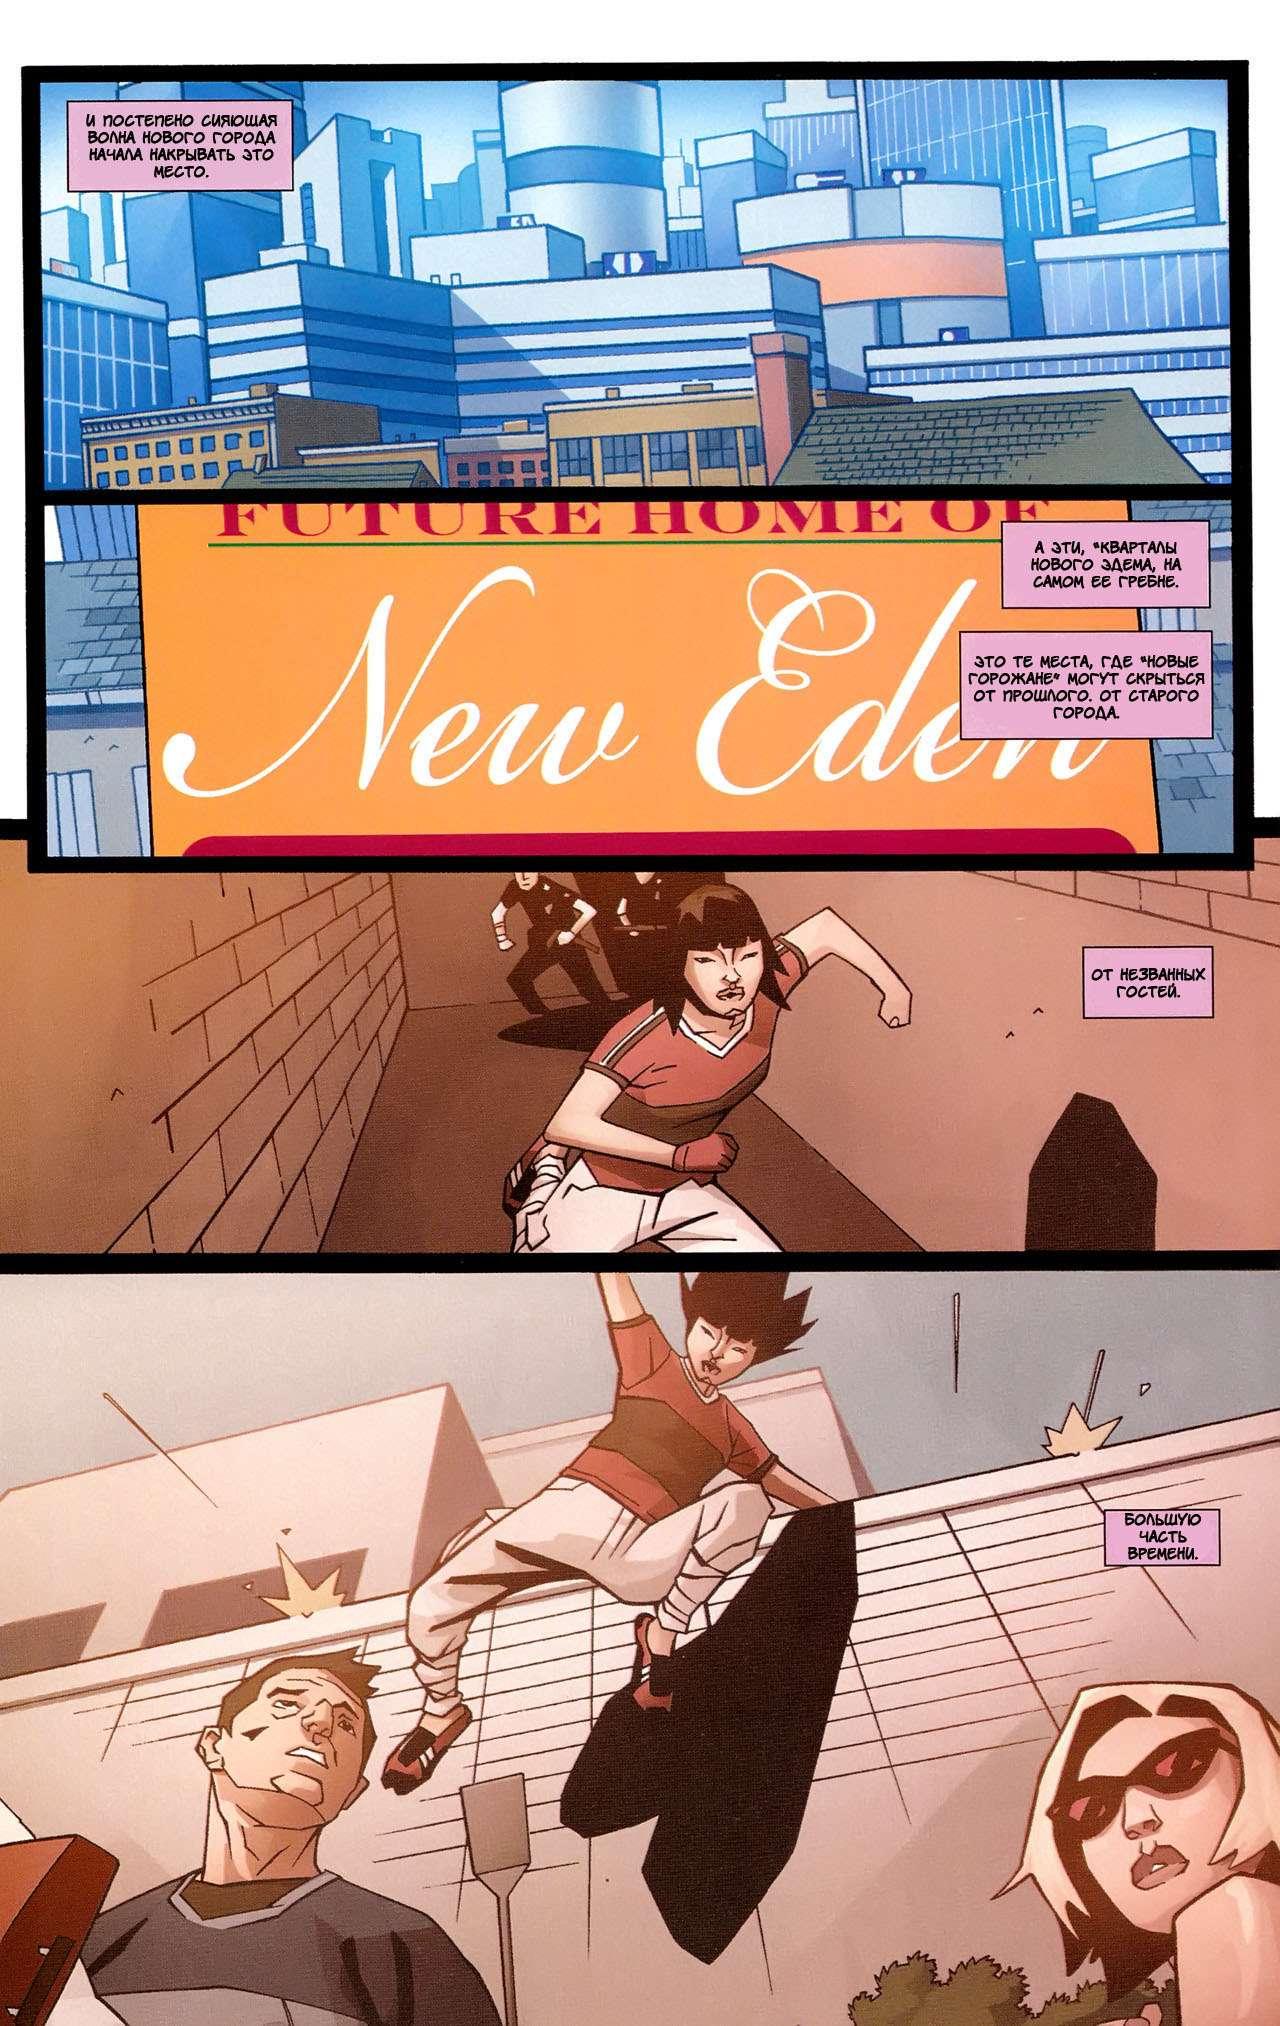 mirrors-edge-05-pg-18